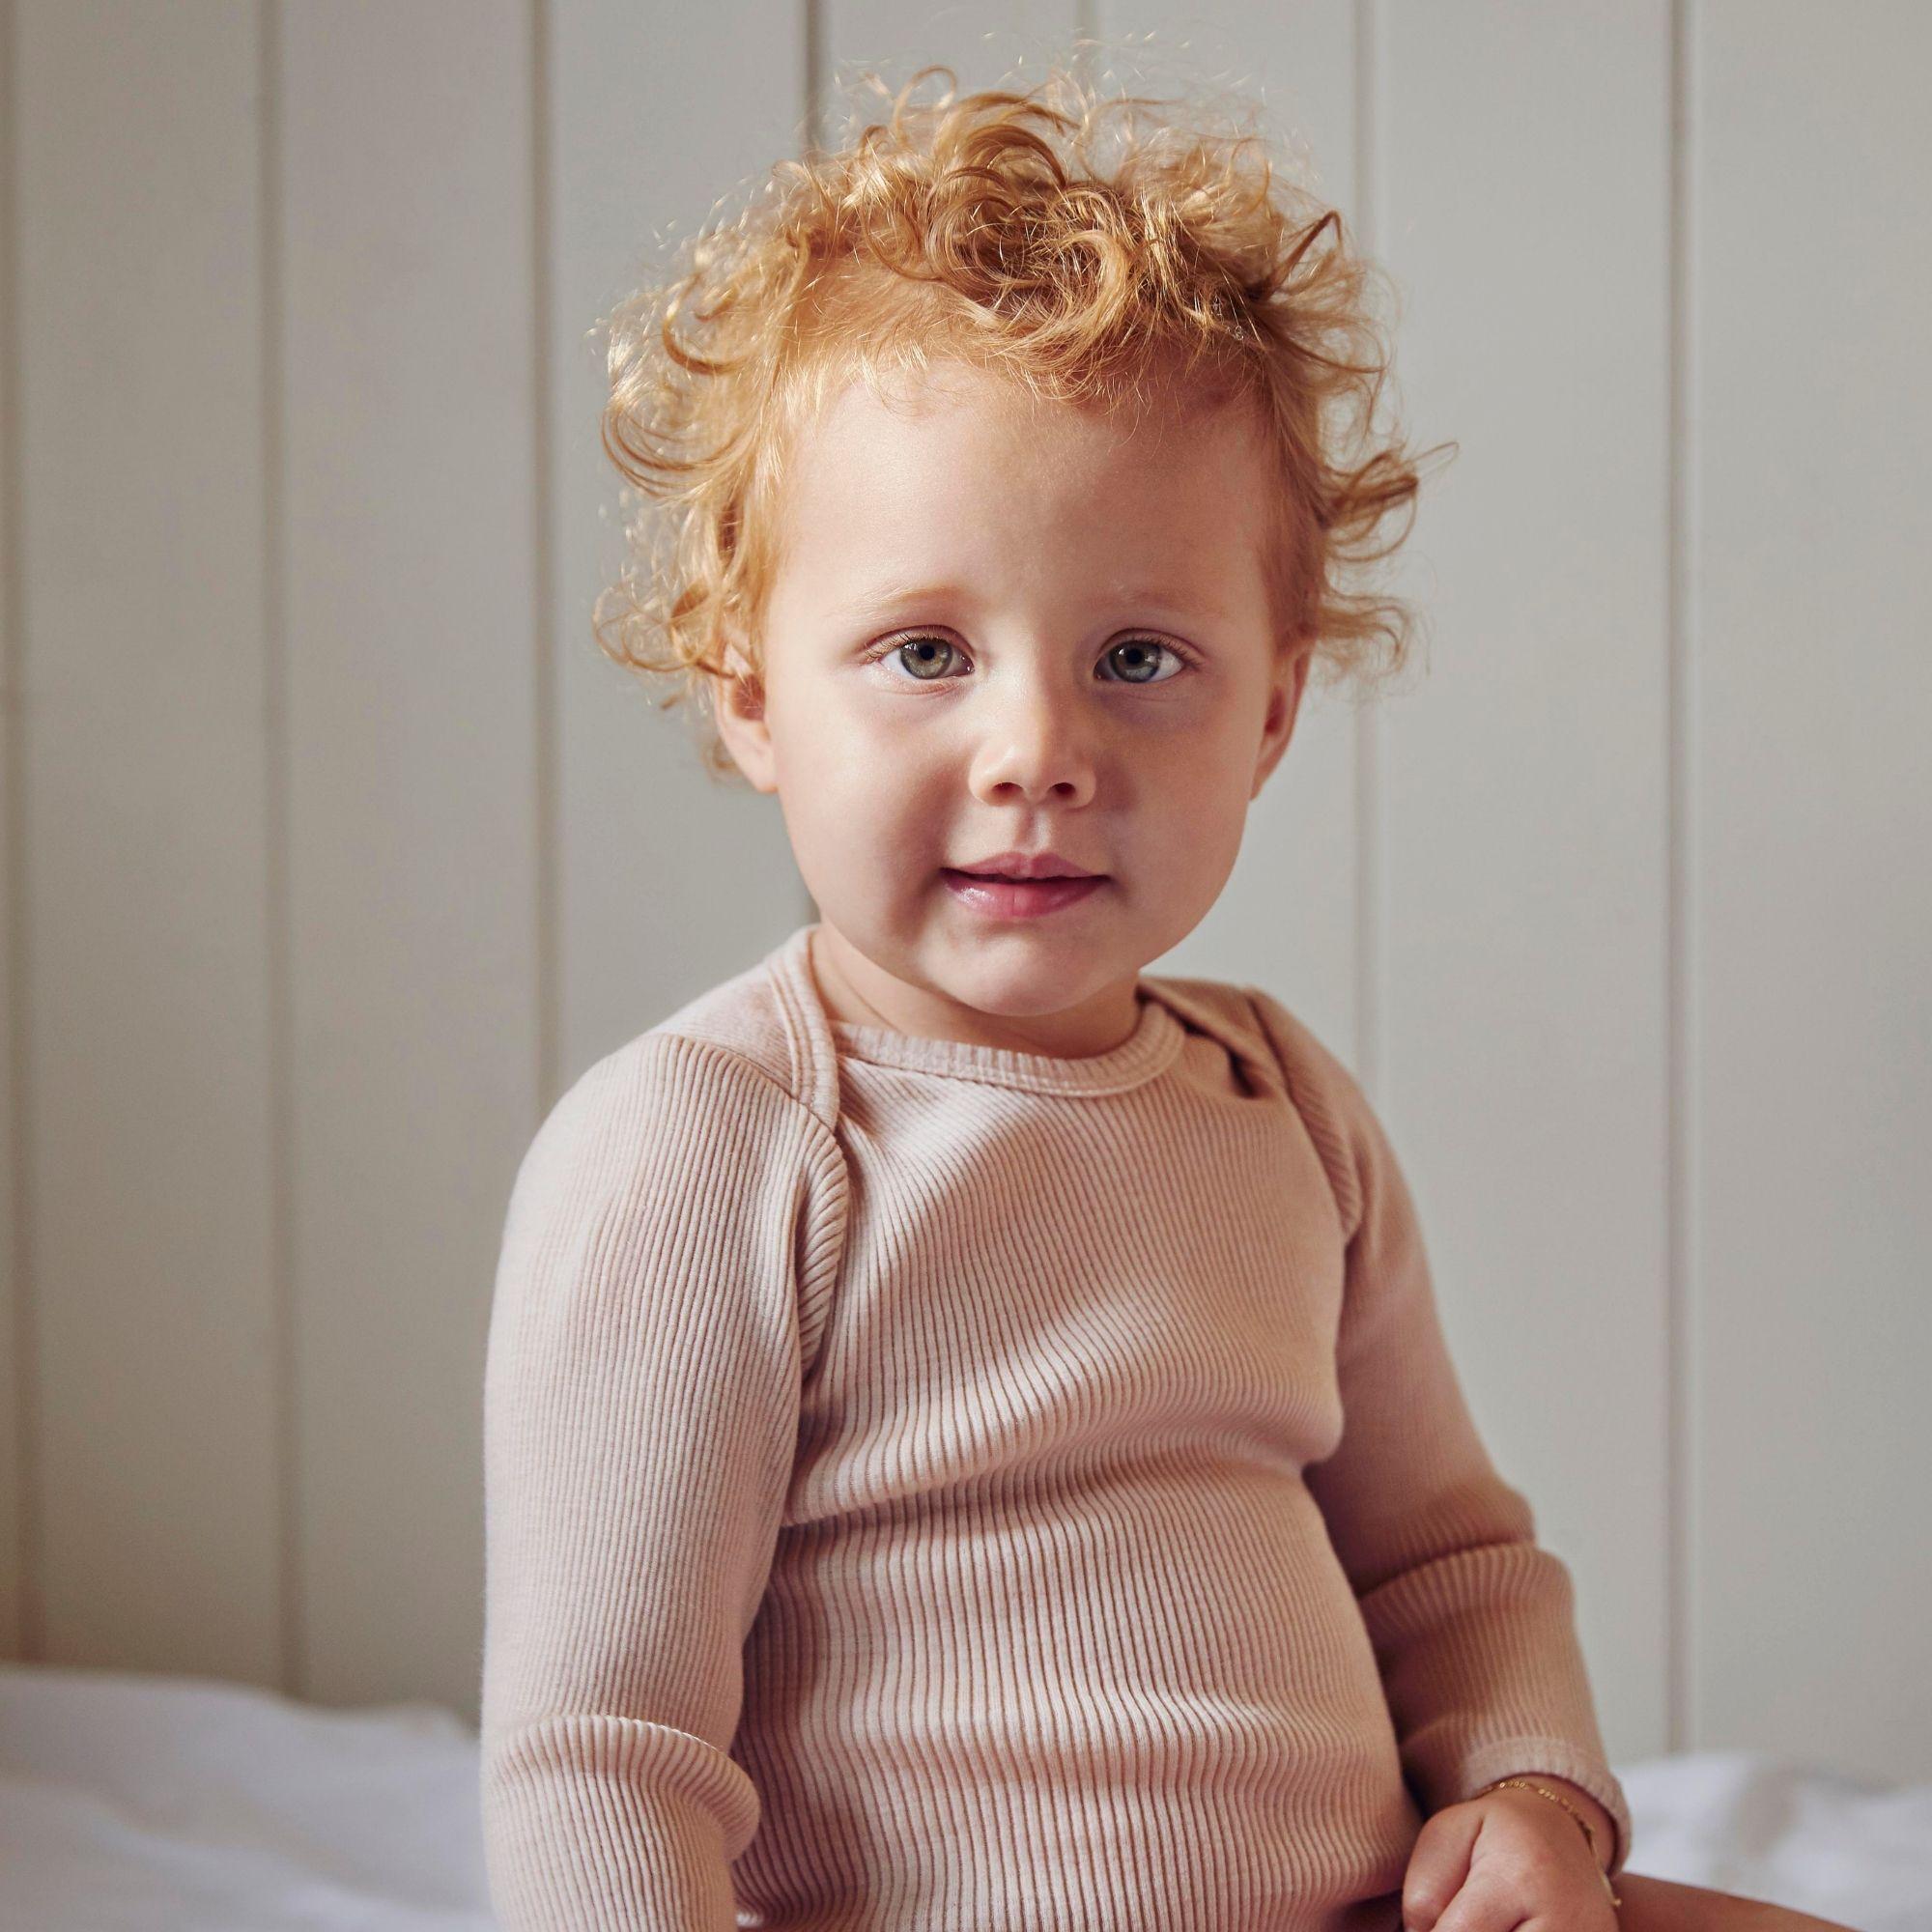 tshirt-manches-longus-bebe-enfant-pure-laine-merinos-minimalisma-maison-de-mamoulia-aspen-sable-sand